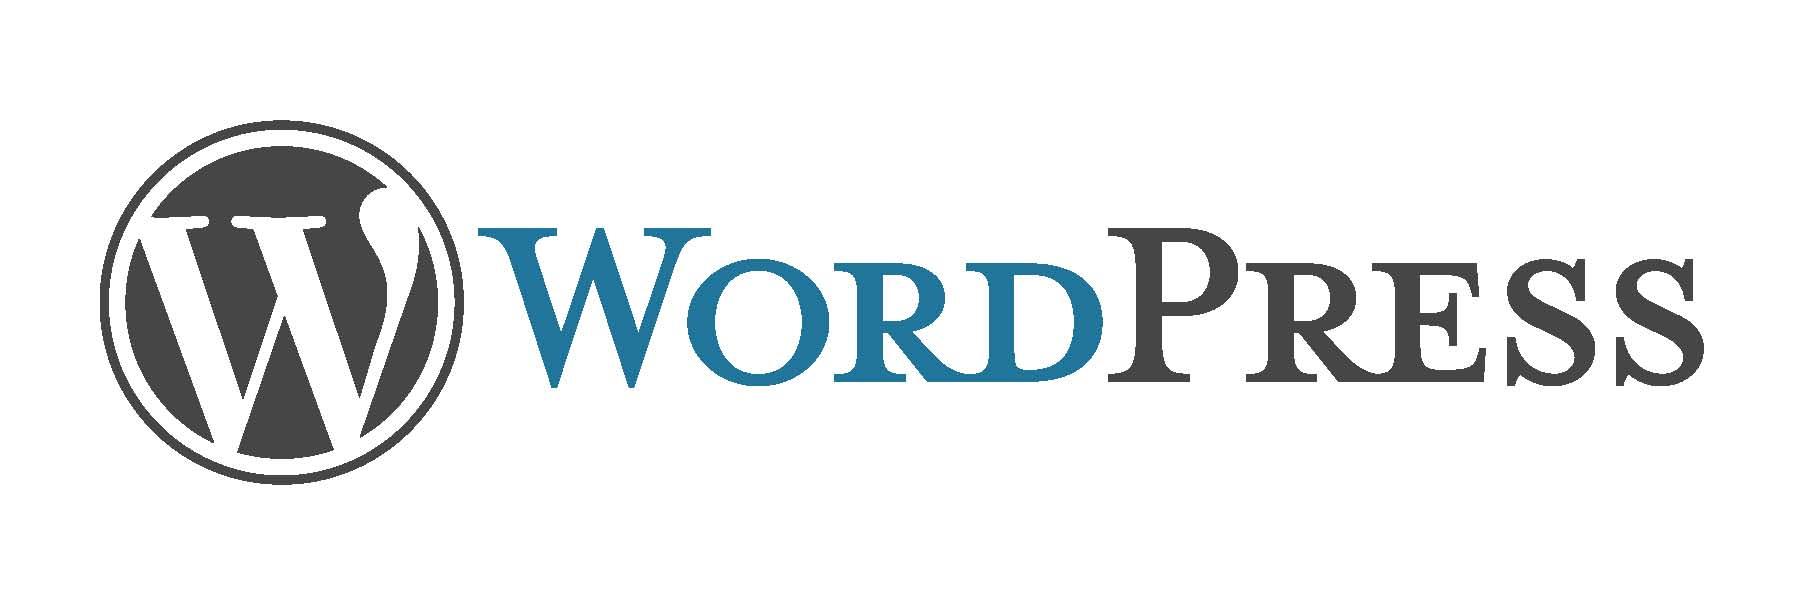 studiobyte wordpress